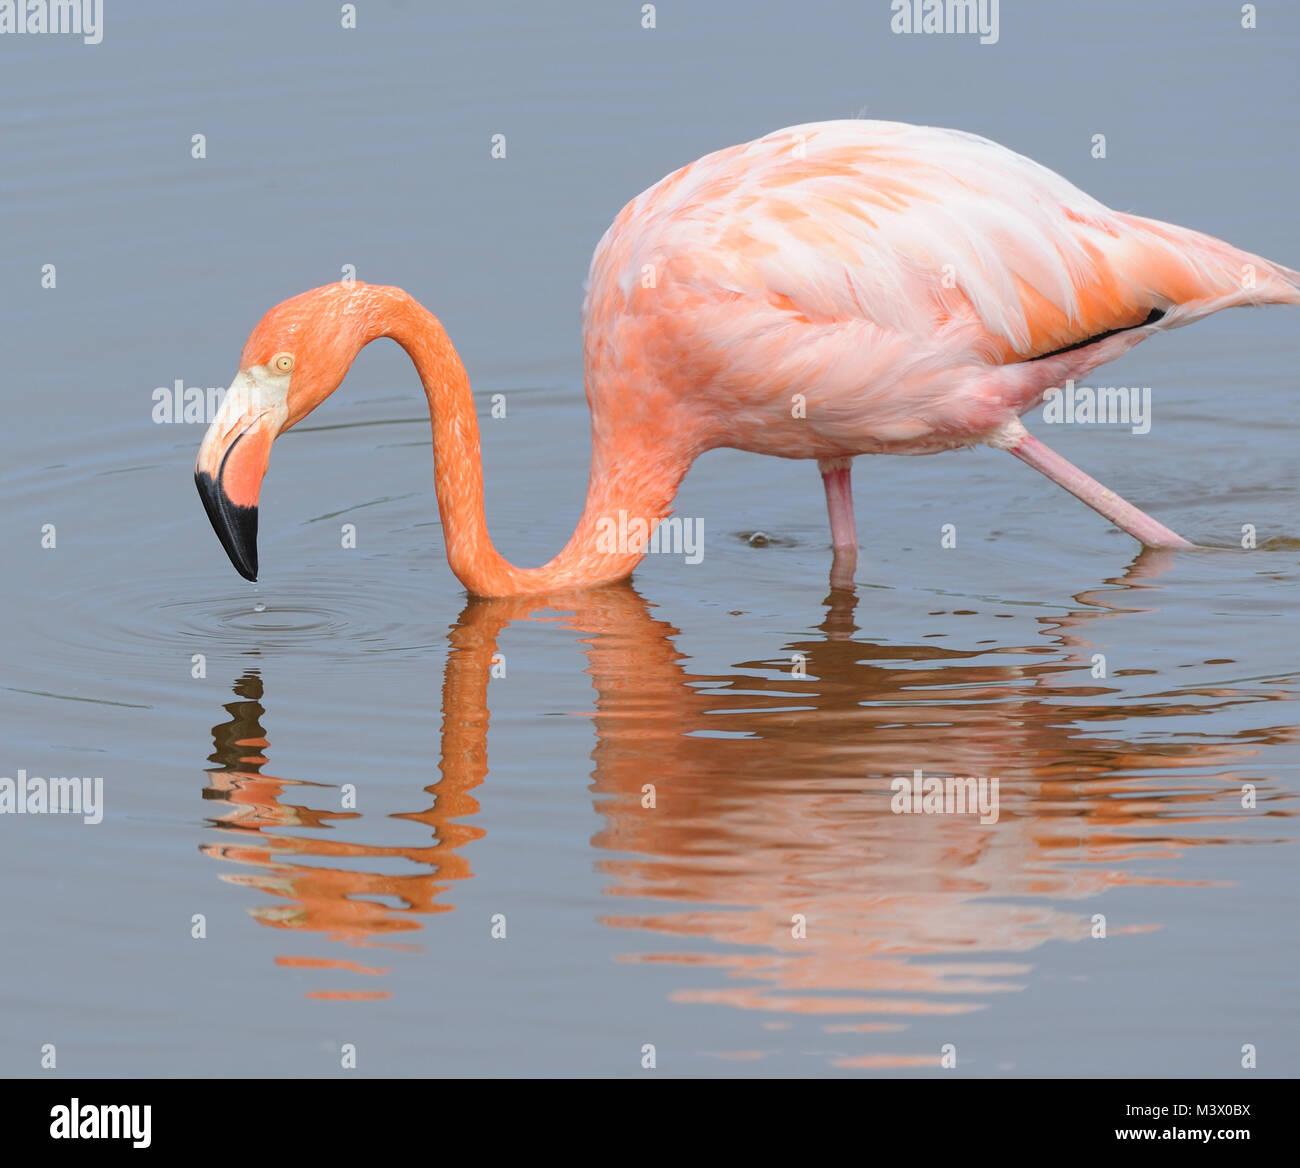 American flamingo (Phoenicopterus ruber) feeding in a lagoon near Puerto Villamil. Puerto Villamil, Isabela, Galapagos, Stock Photo